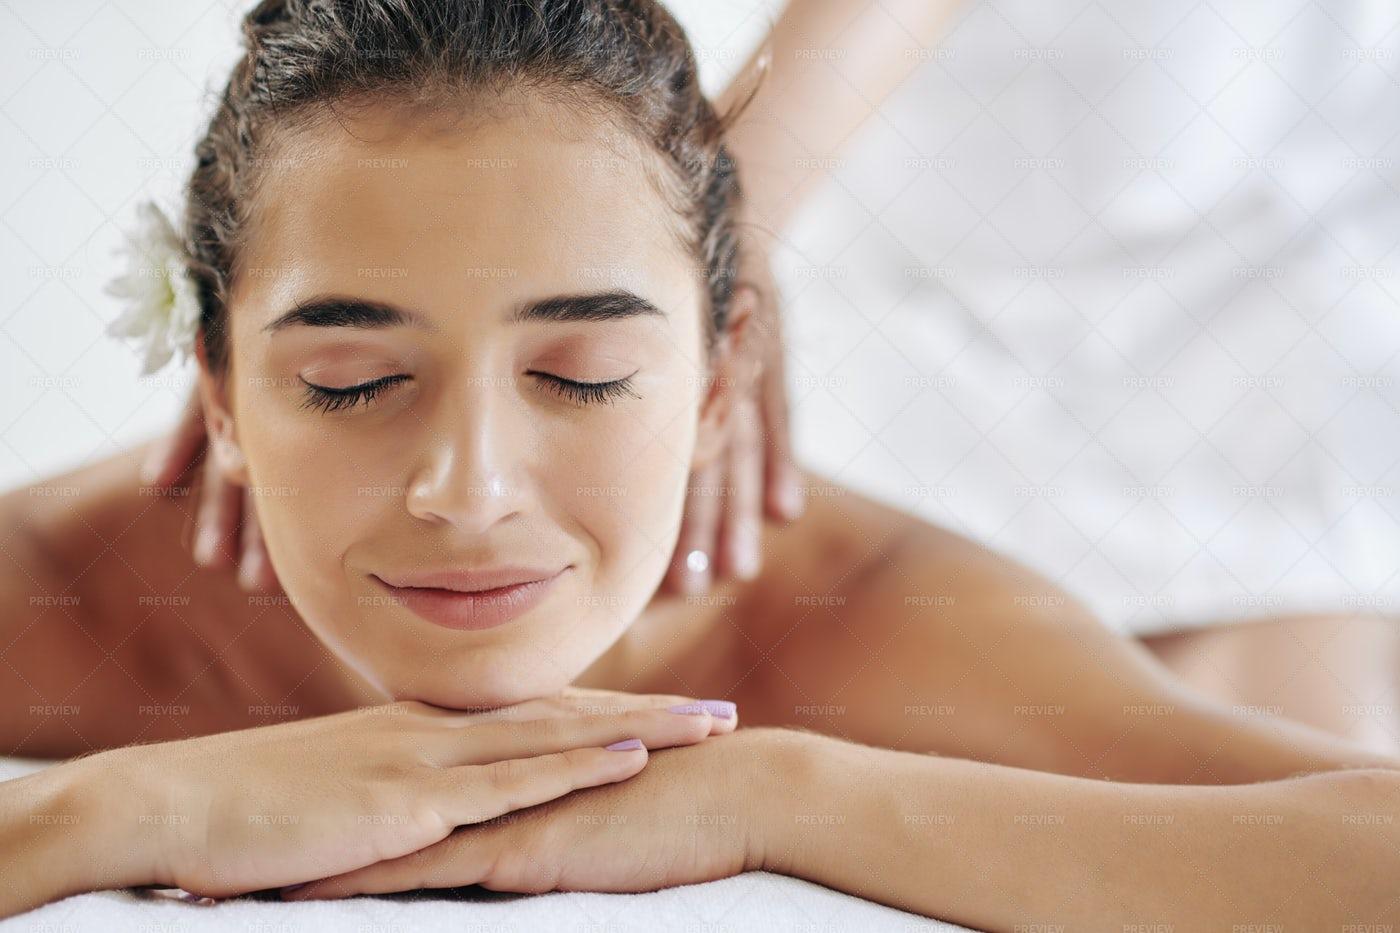 Pleasure Of Getting Massage: Stock Photos